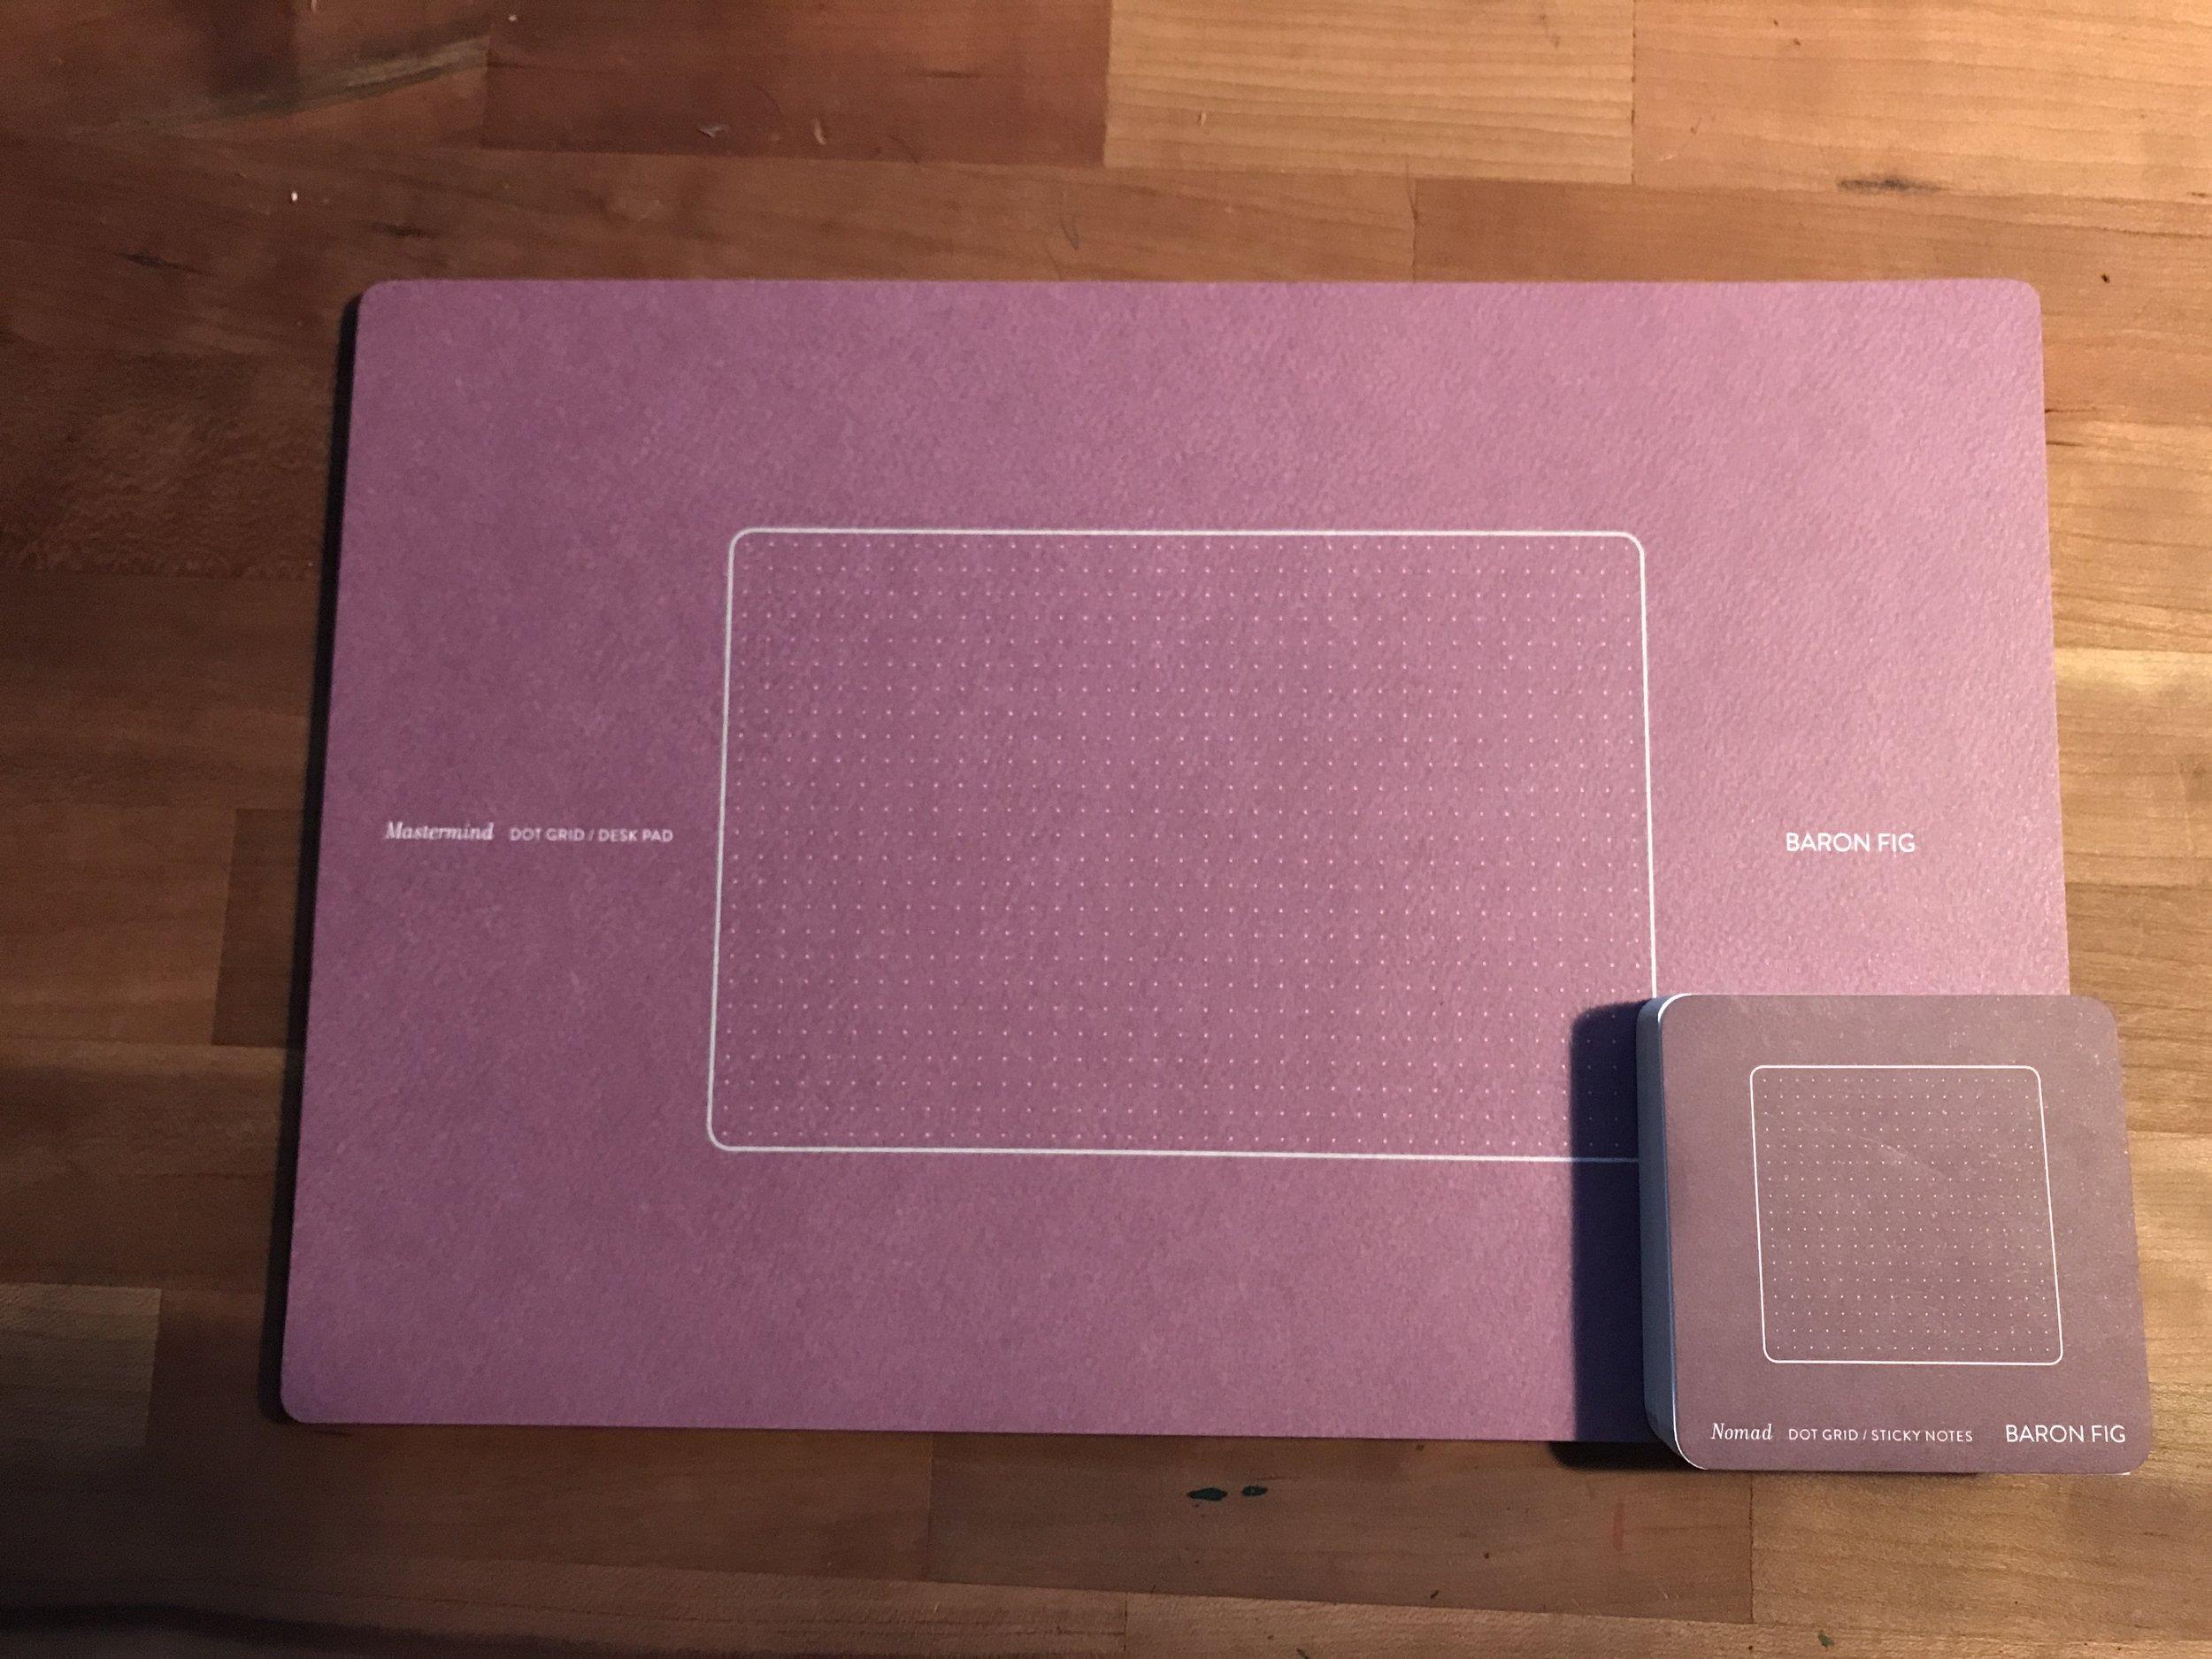 baron-fig-nomad-mastermind-packaging.jpg